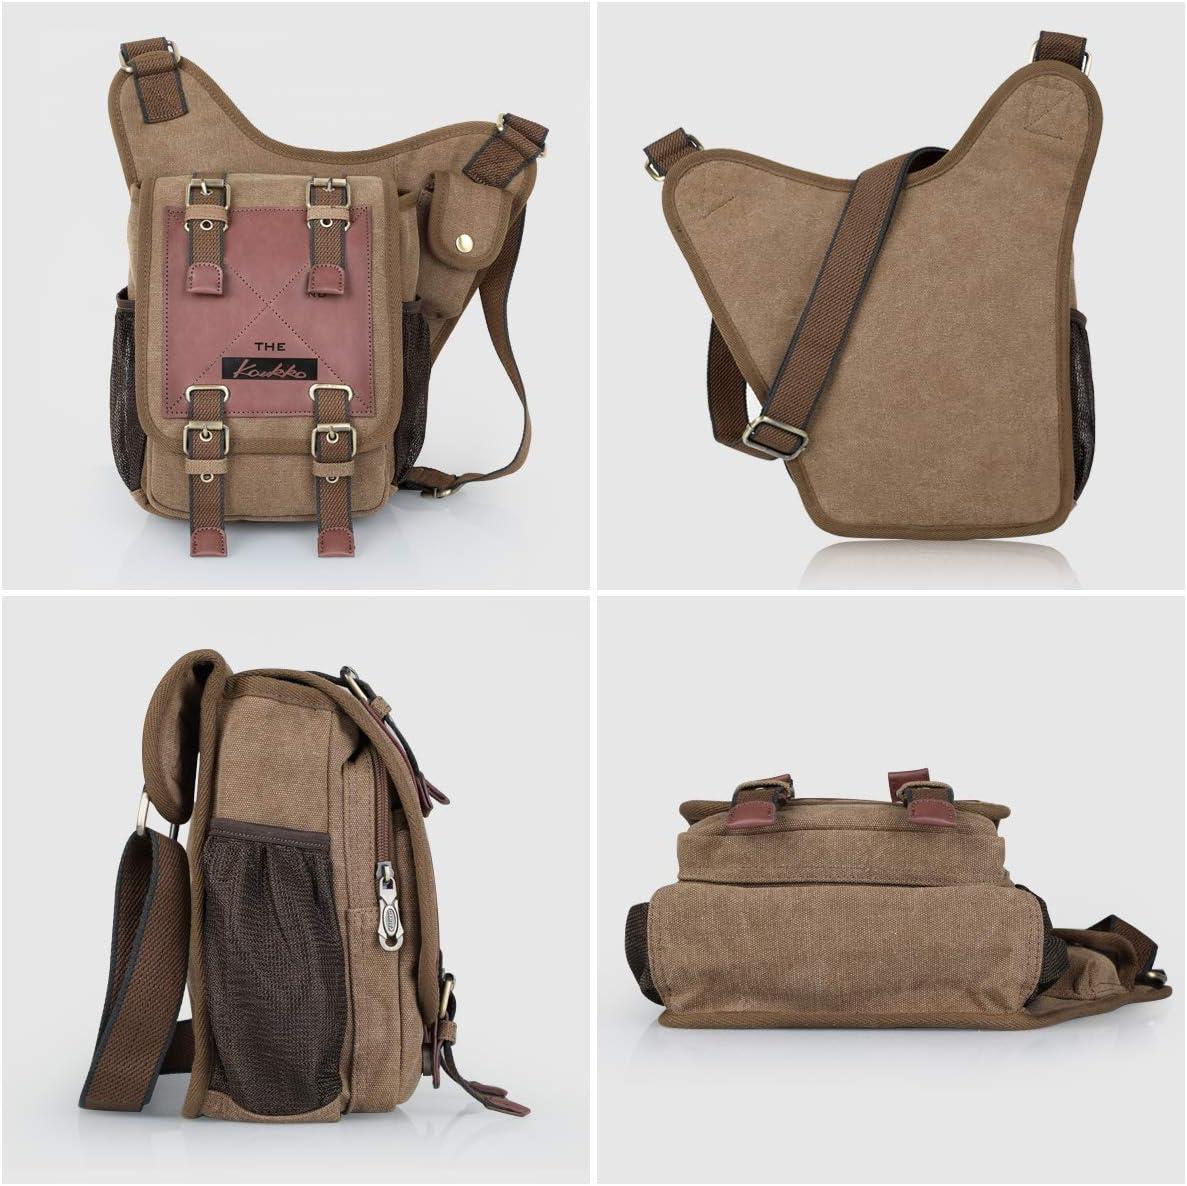 MG8540 Military Style Cotton Canvas Backpack School Bag Messenger Bag,Hiking